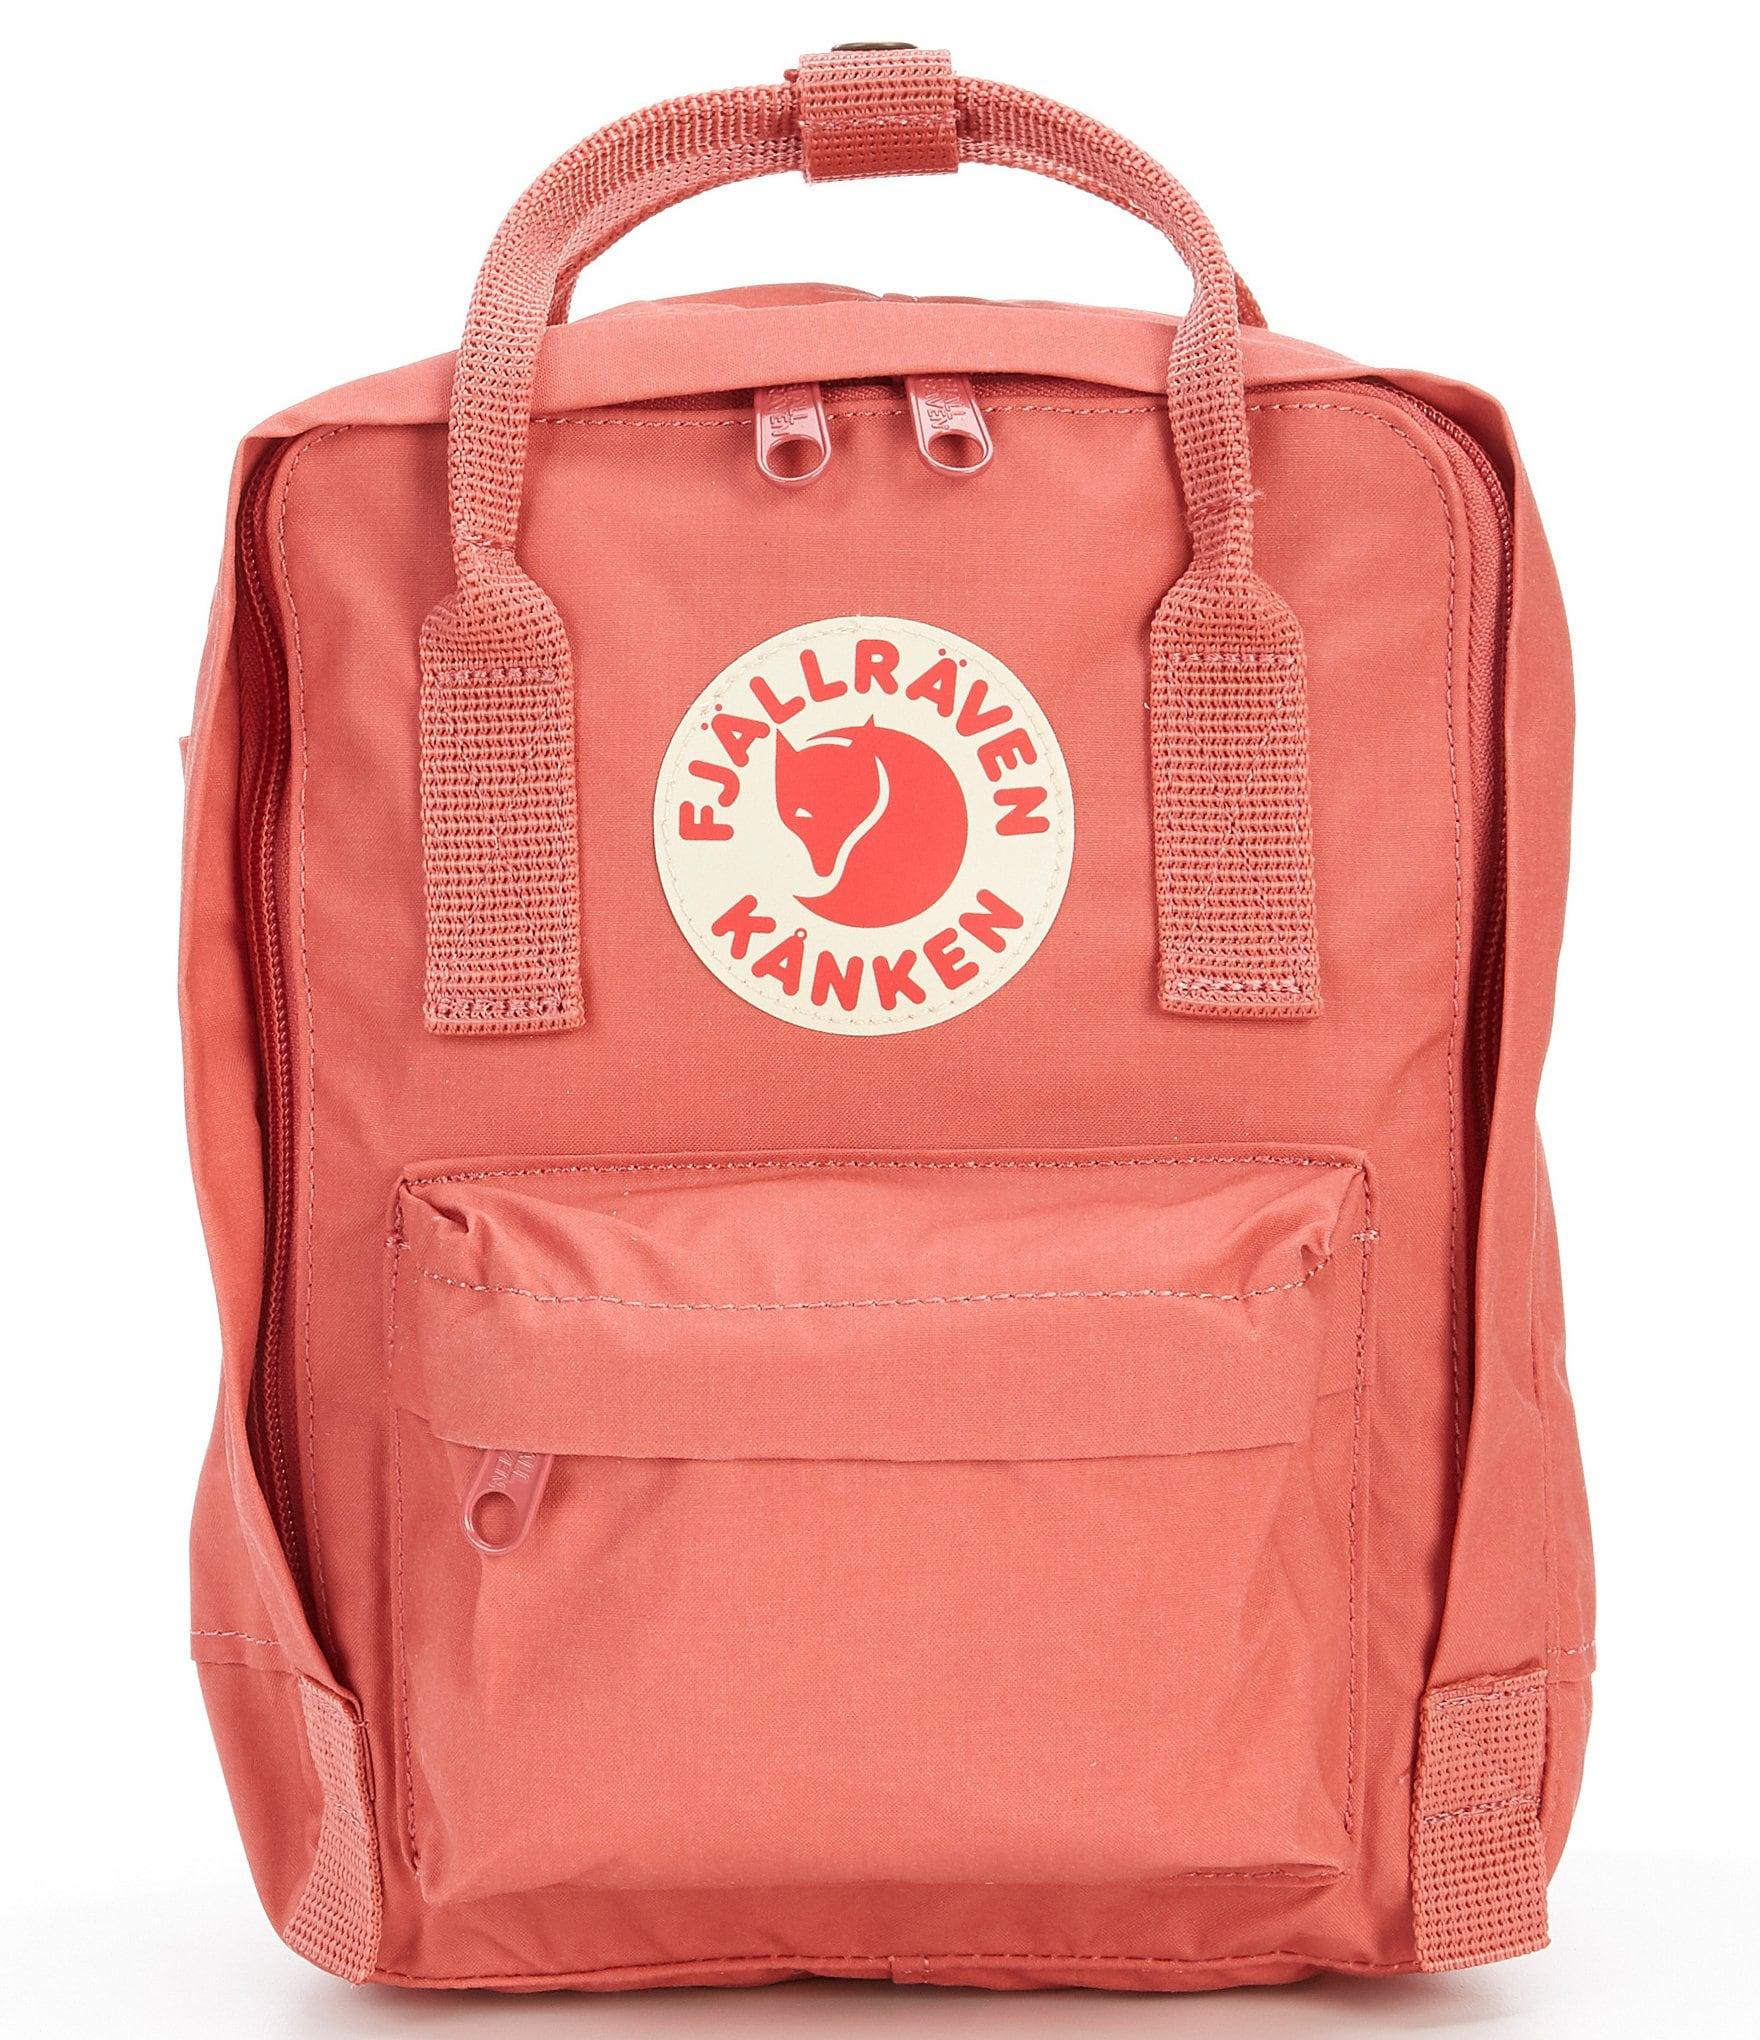 8a5985f042e9 Fjallraven Mini Kanken Water-Resistant Backpack